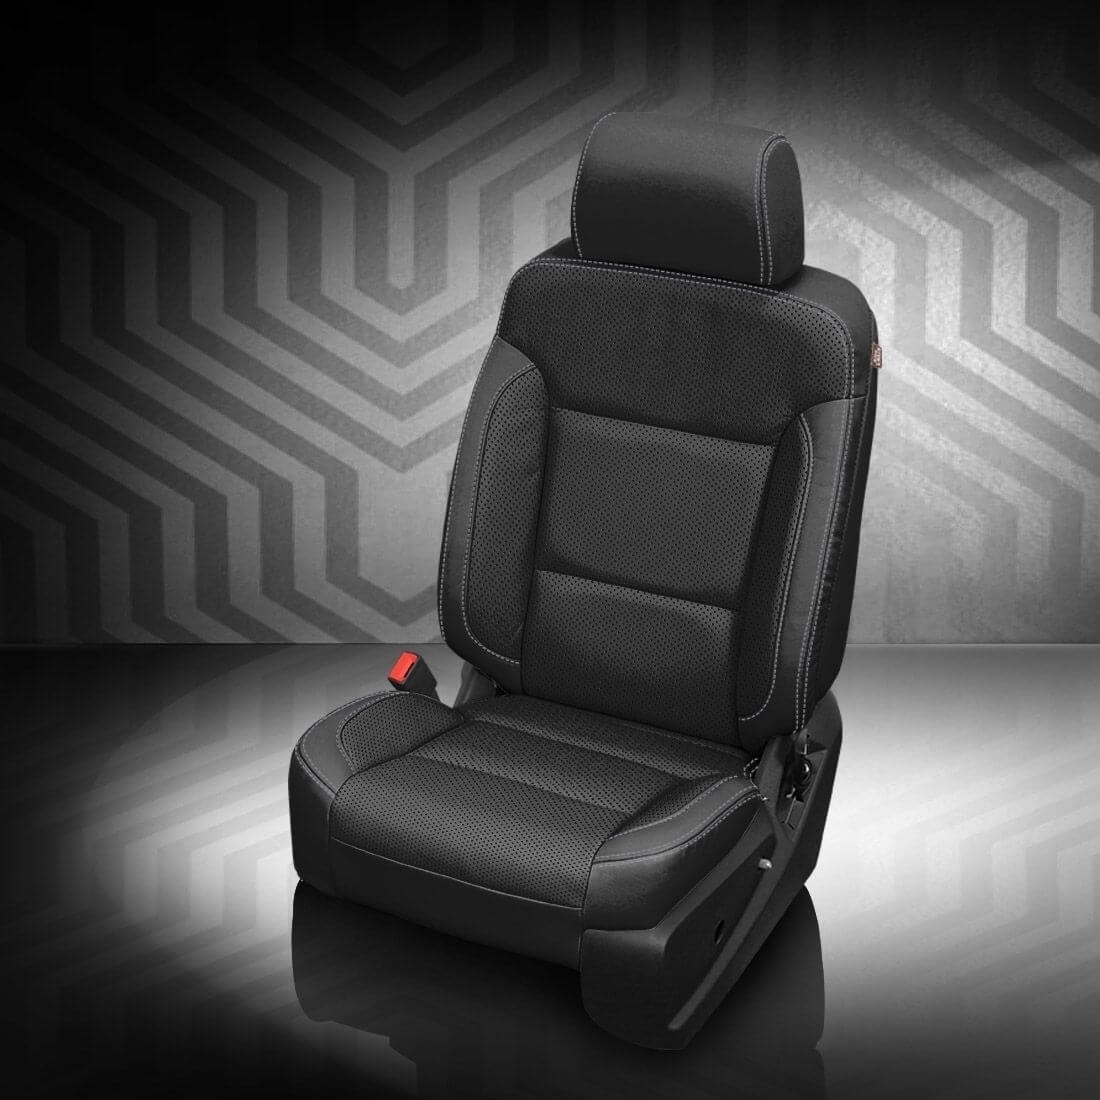 Bench Seat For 1996 Gmc Sierra